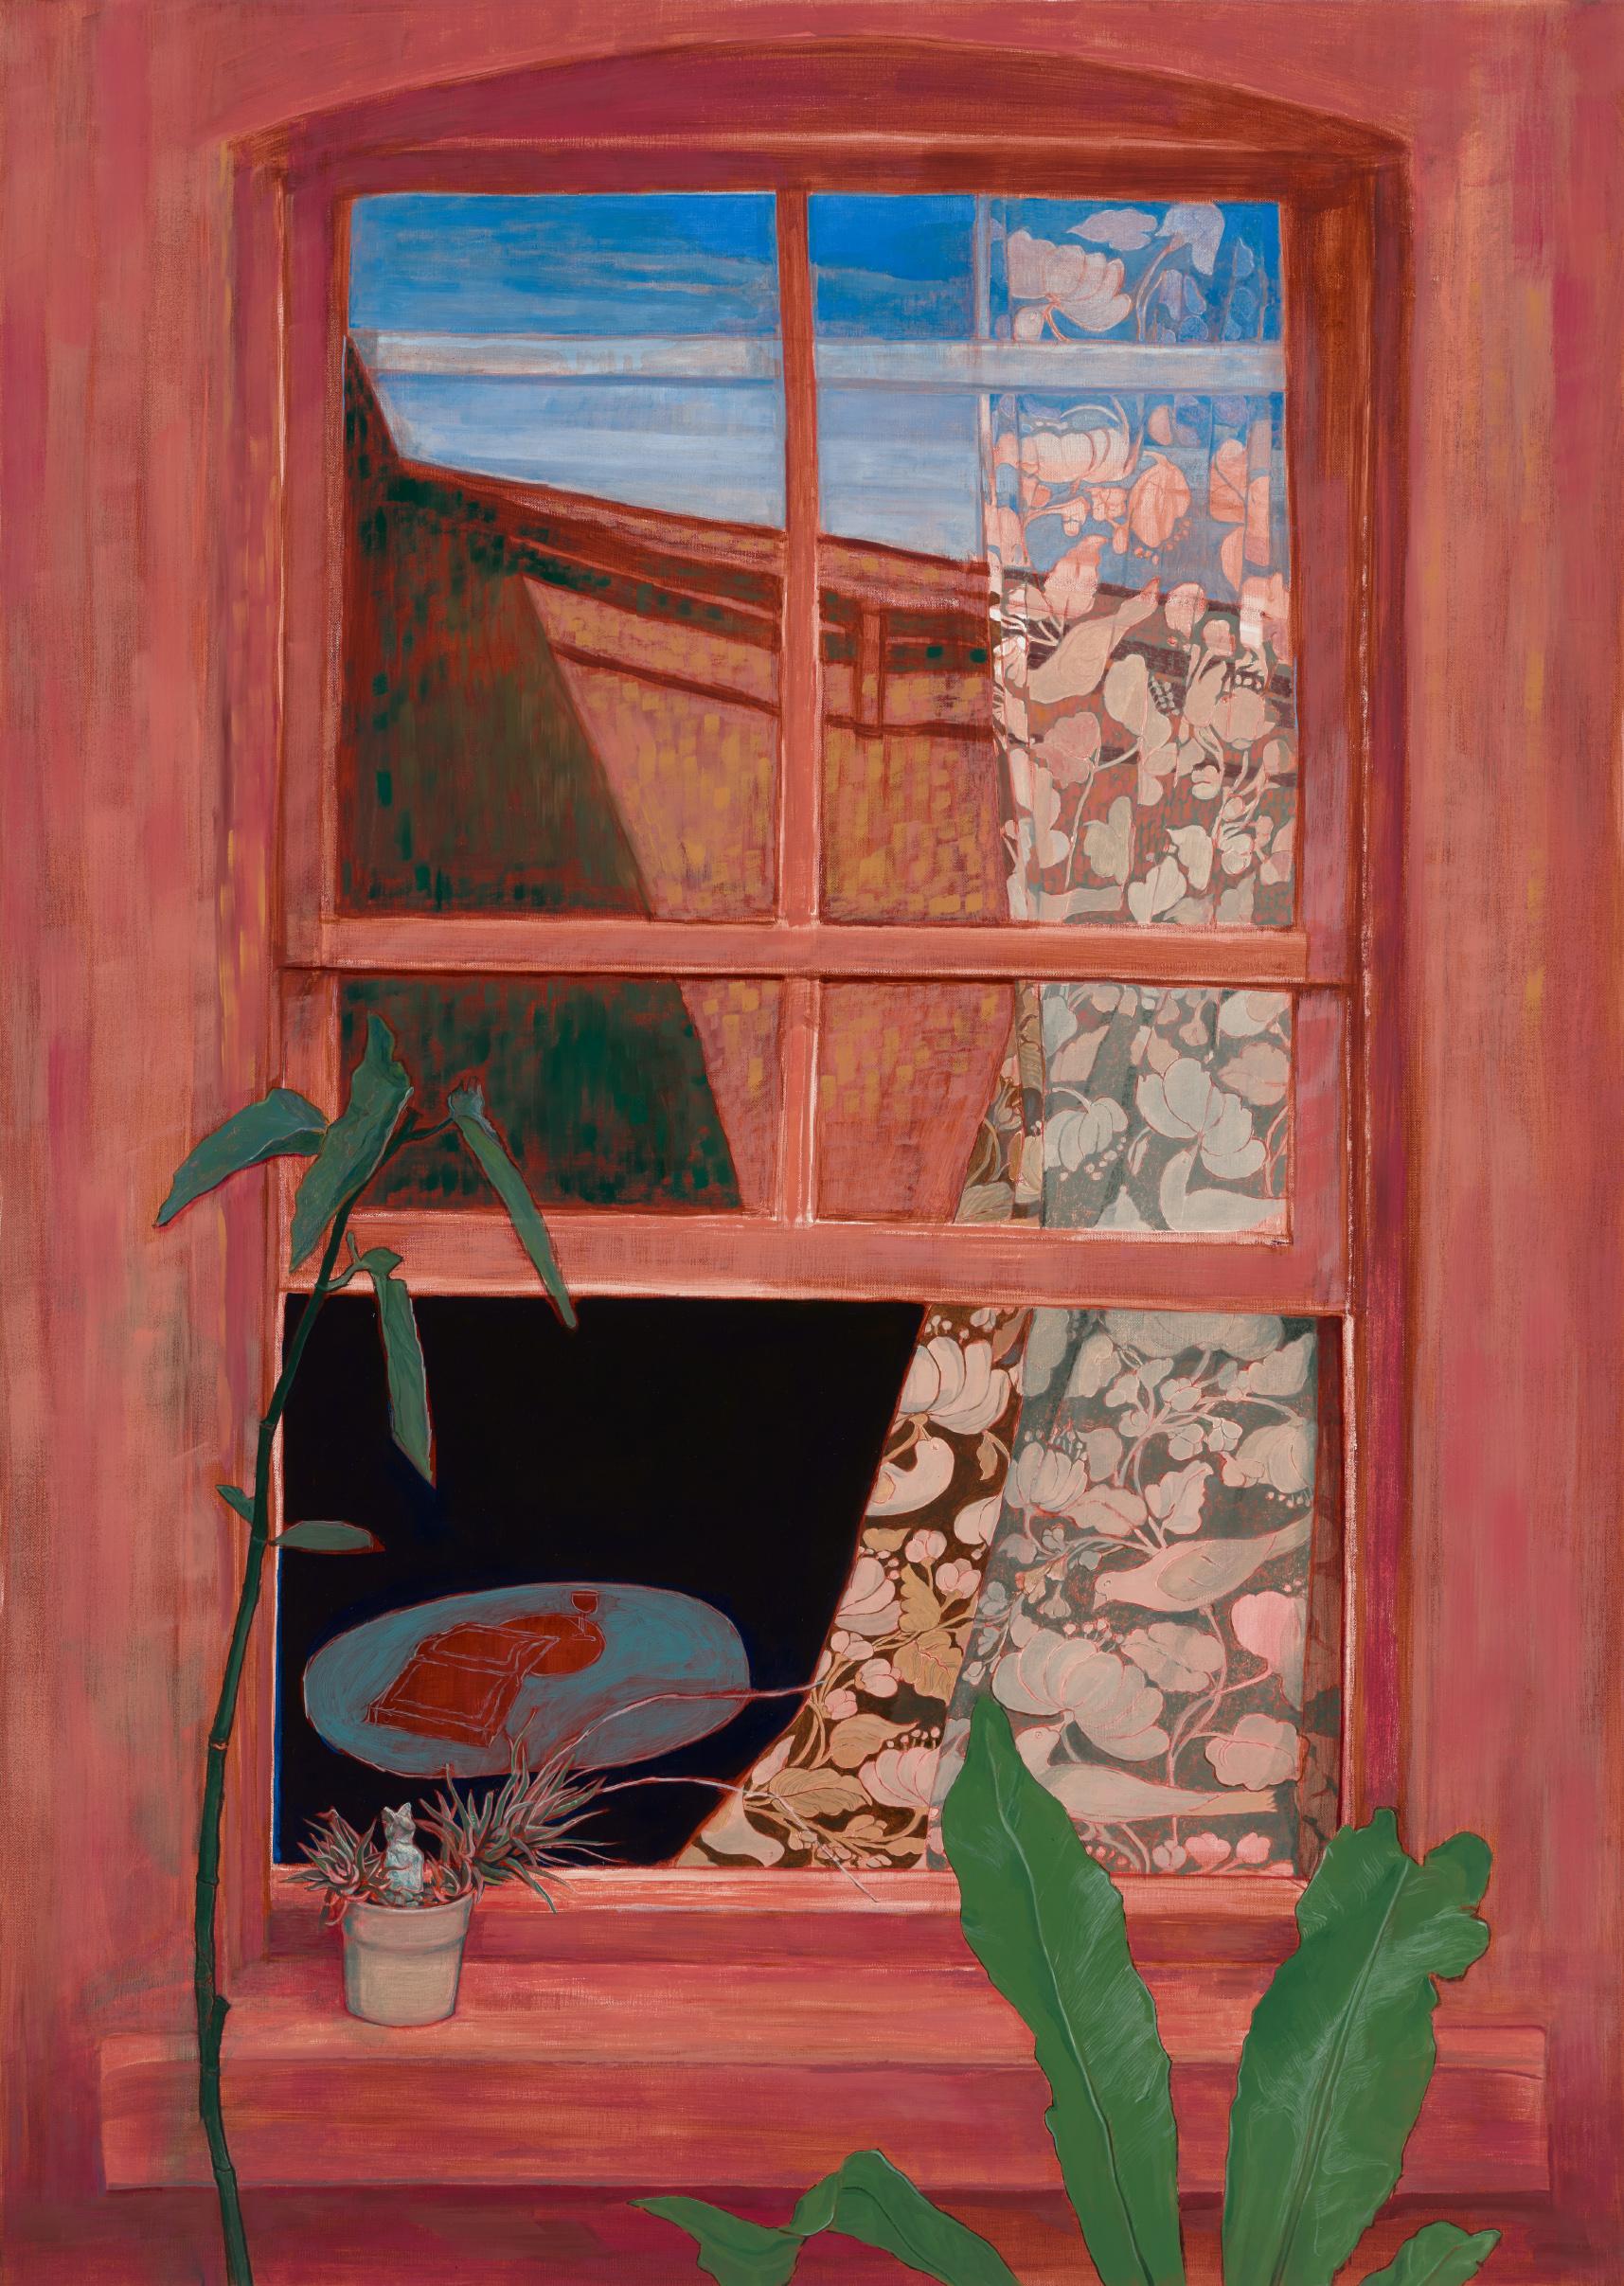 Dayan, Jesse, 'The Red Studio', Oil on Linen. 110x76cm.jpg